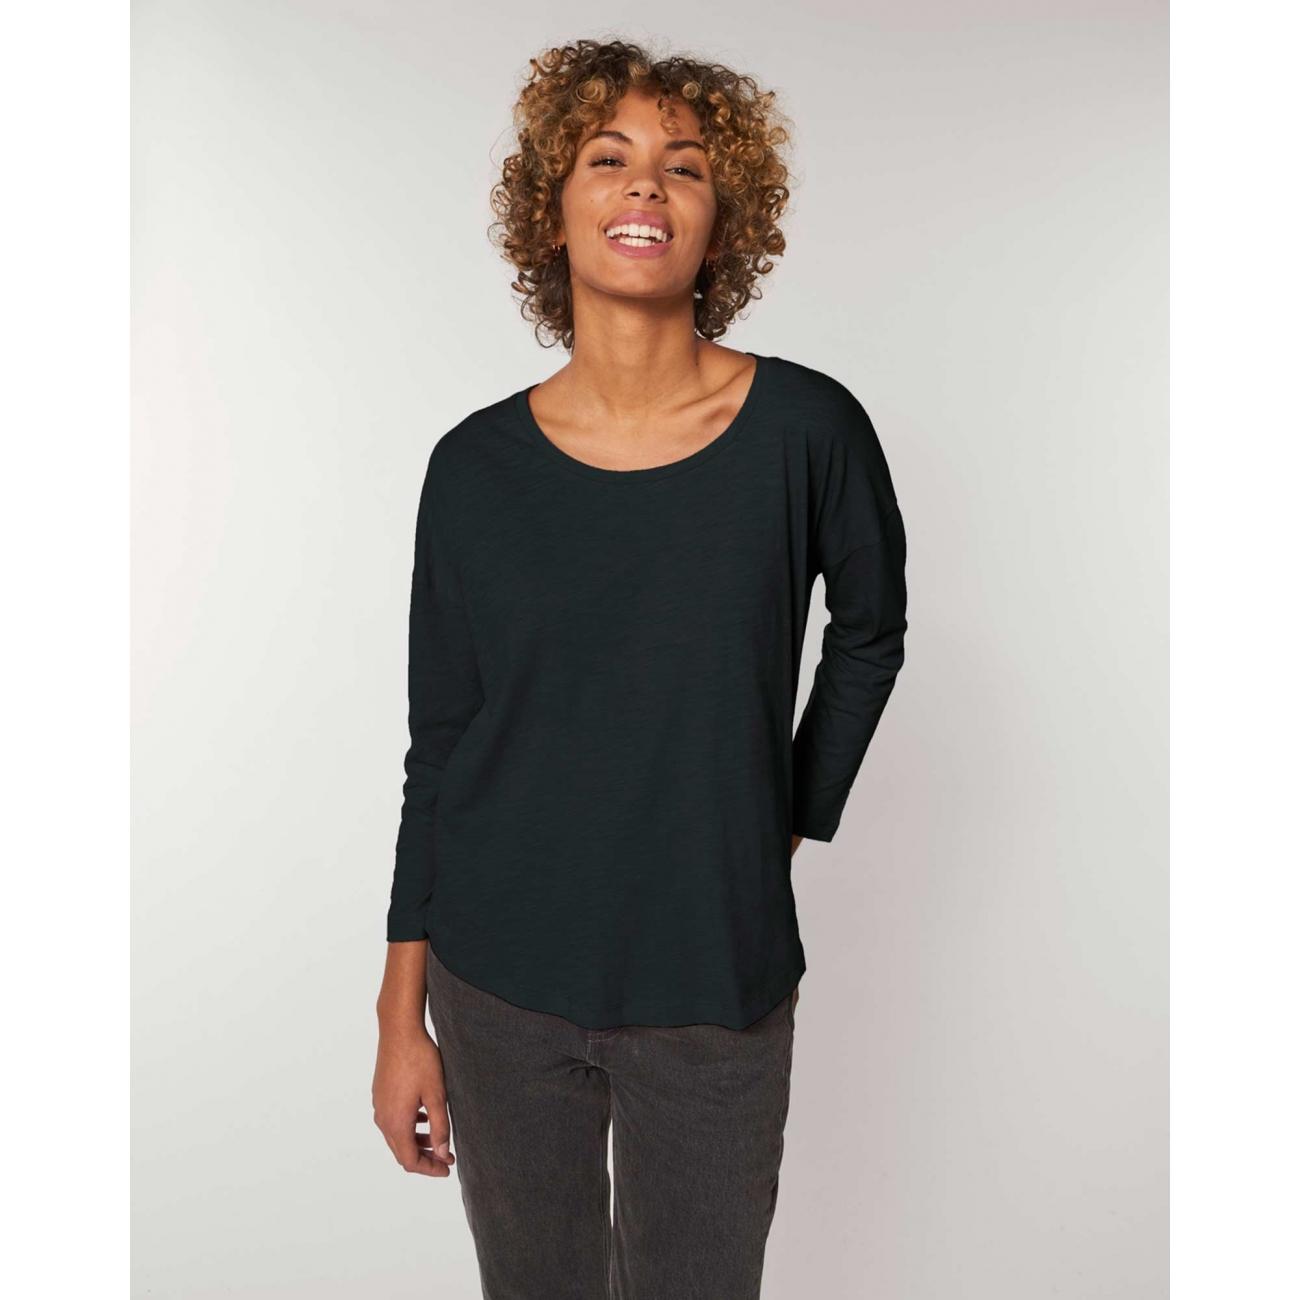 https://tee-shirt-bio.com/9208-thickbox_default/tshirt-femme-manches-34-epaules-tombantes-manches-serrees-coton-bio-fwf-noir-flamme-.jpg